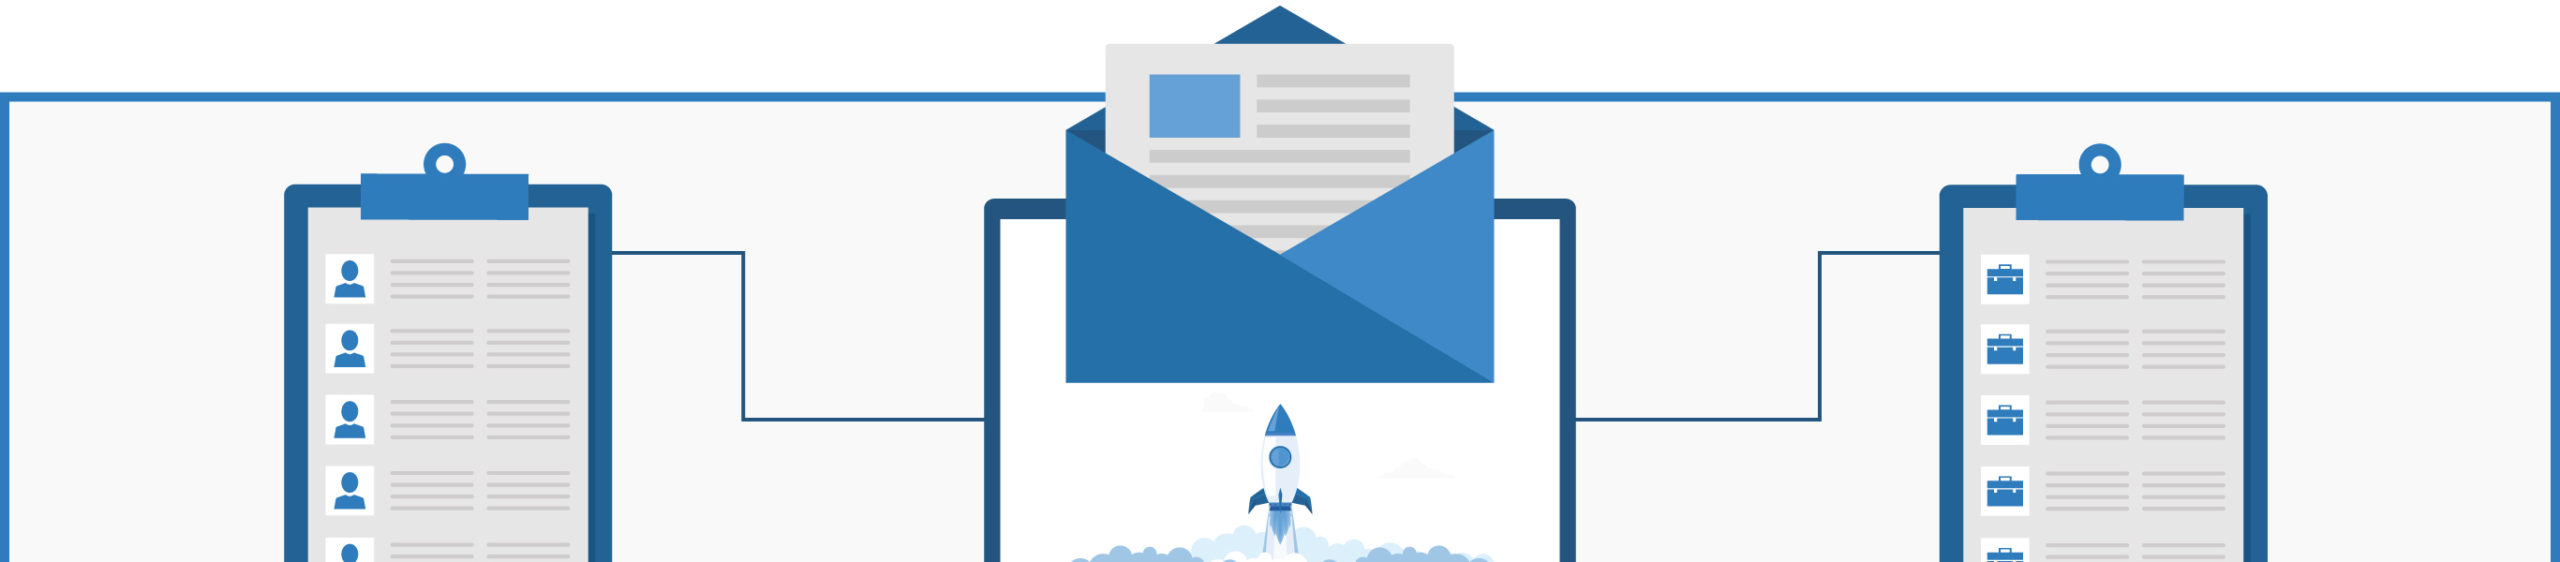 Email list building infographic desktop